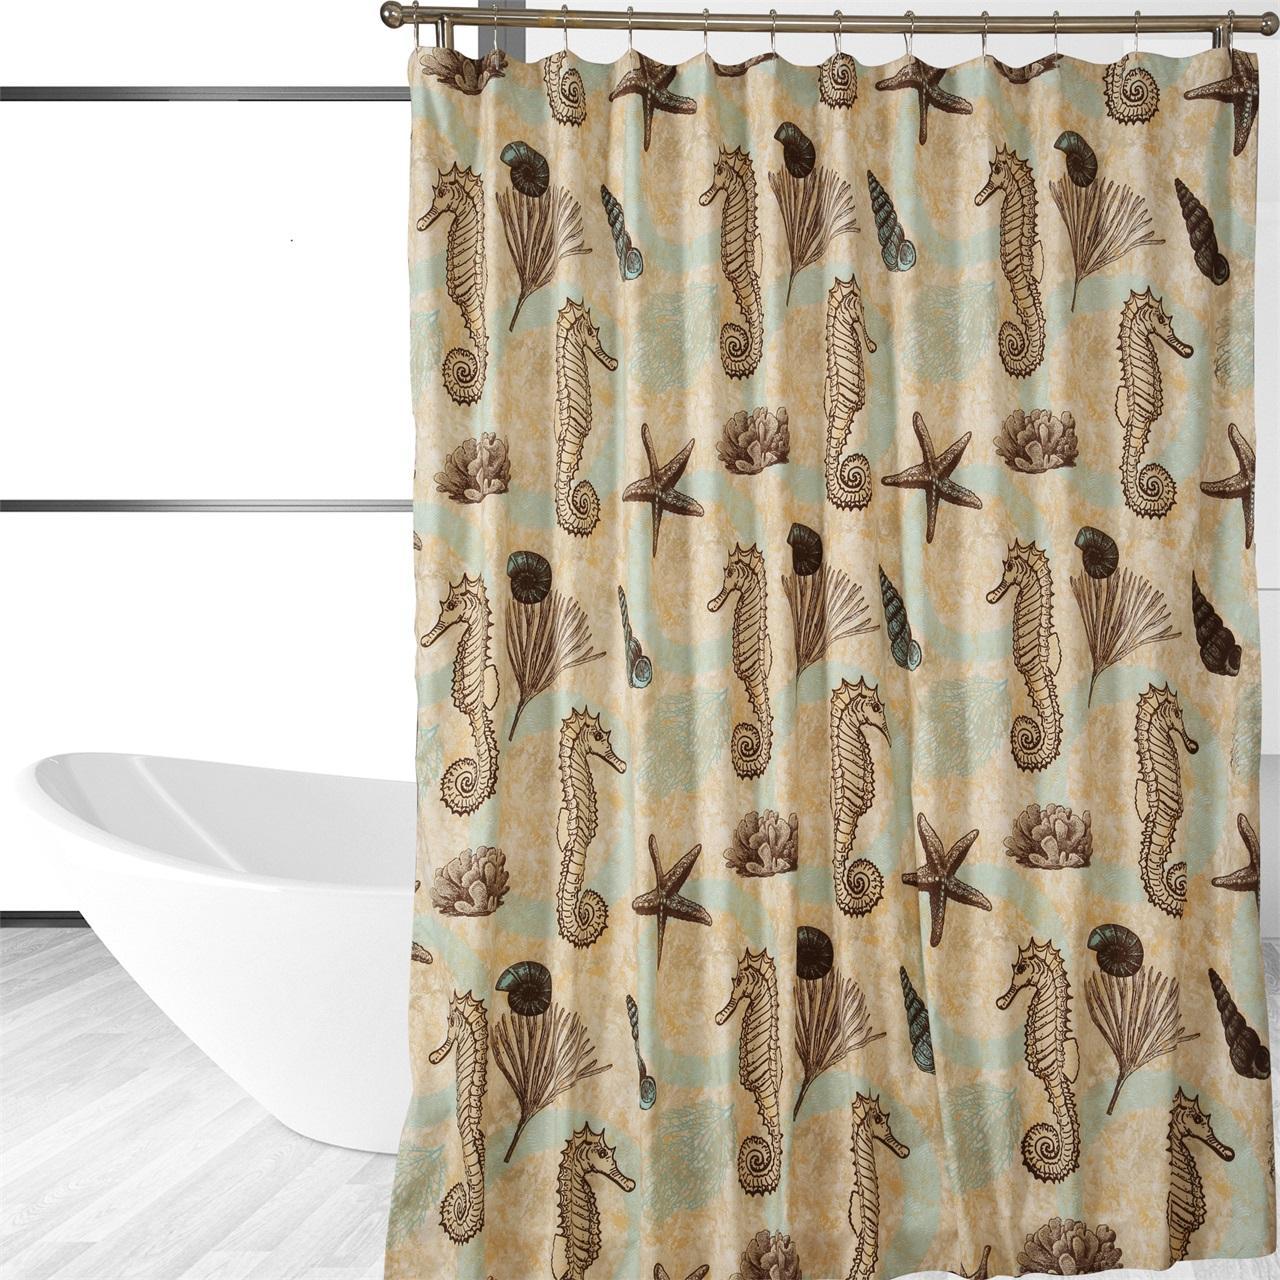 sea horse shower curtain home kitchen. Black Bedroom Furniture Sets. Home Design Ideas